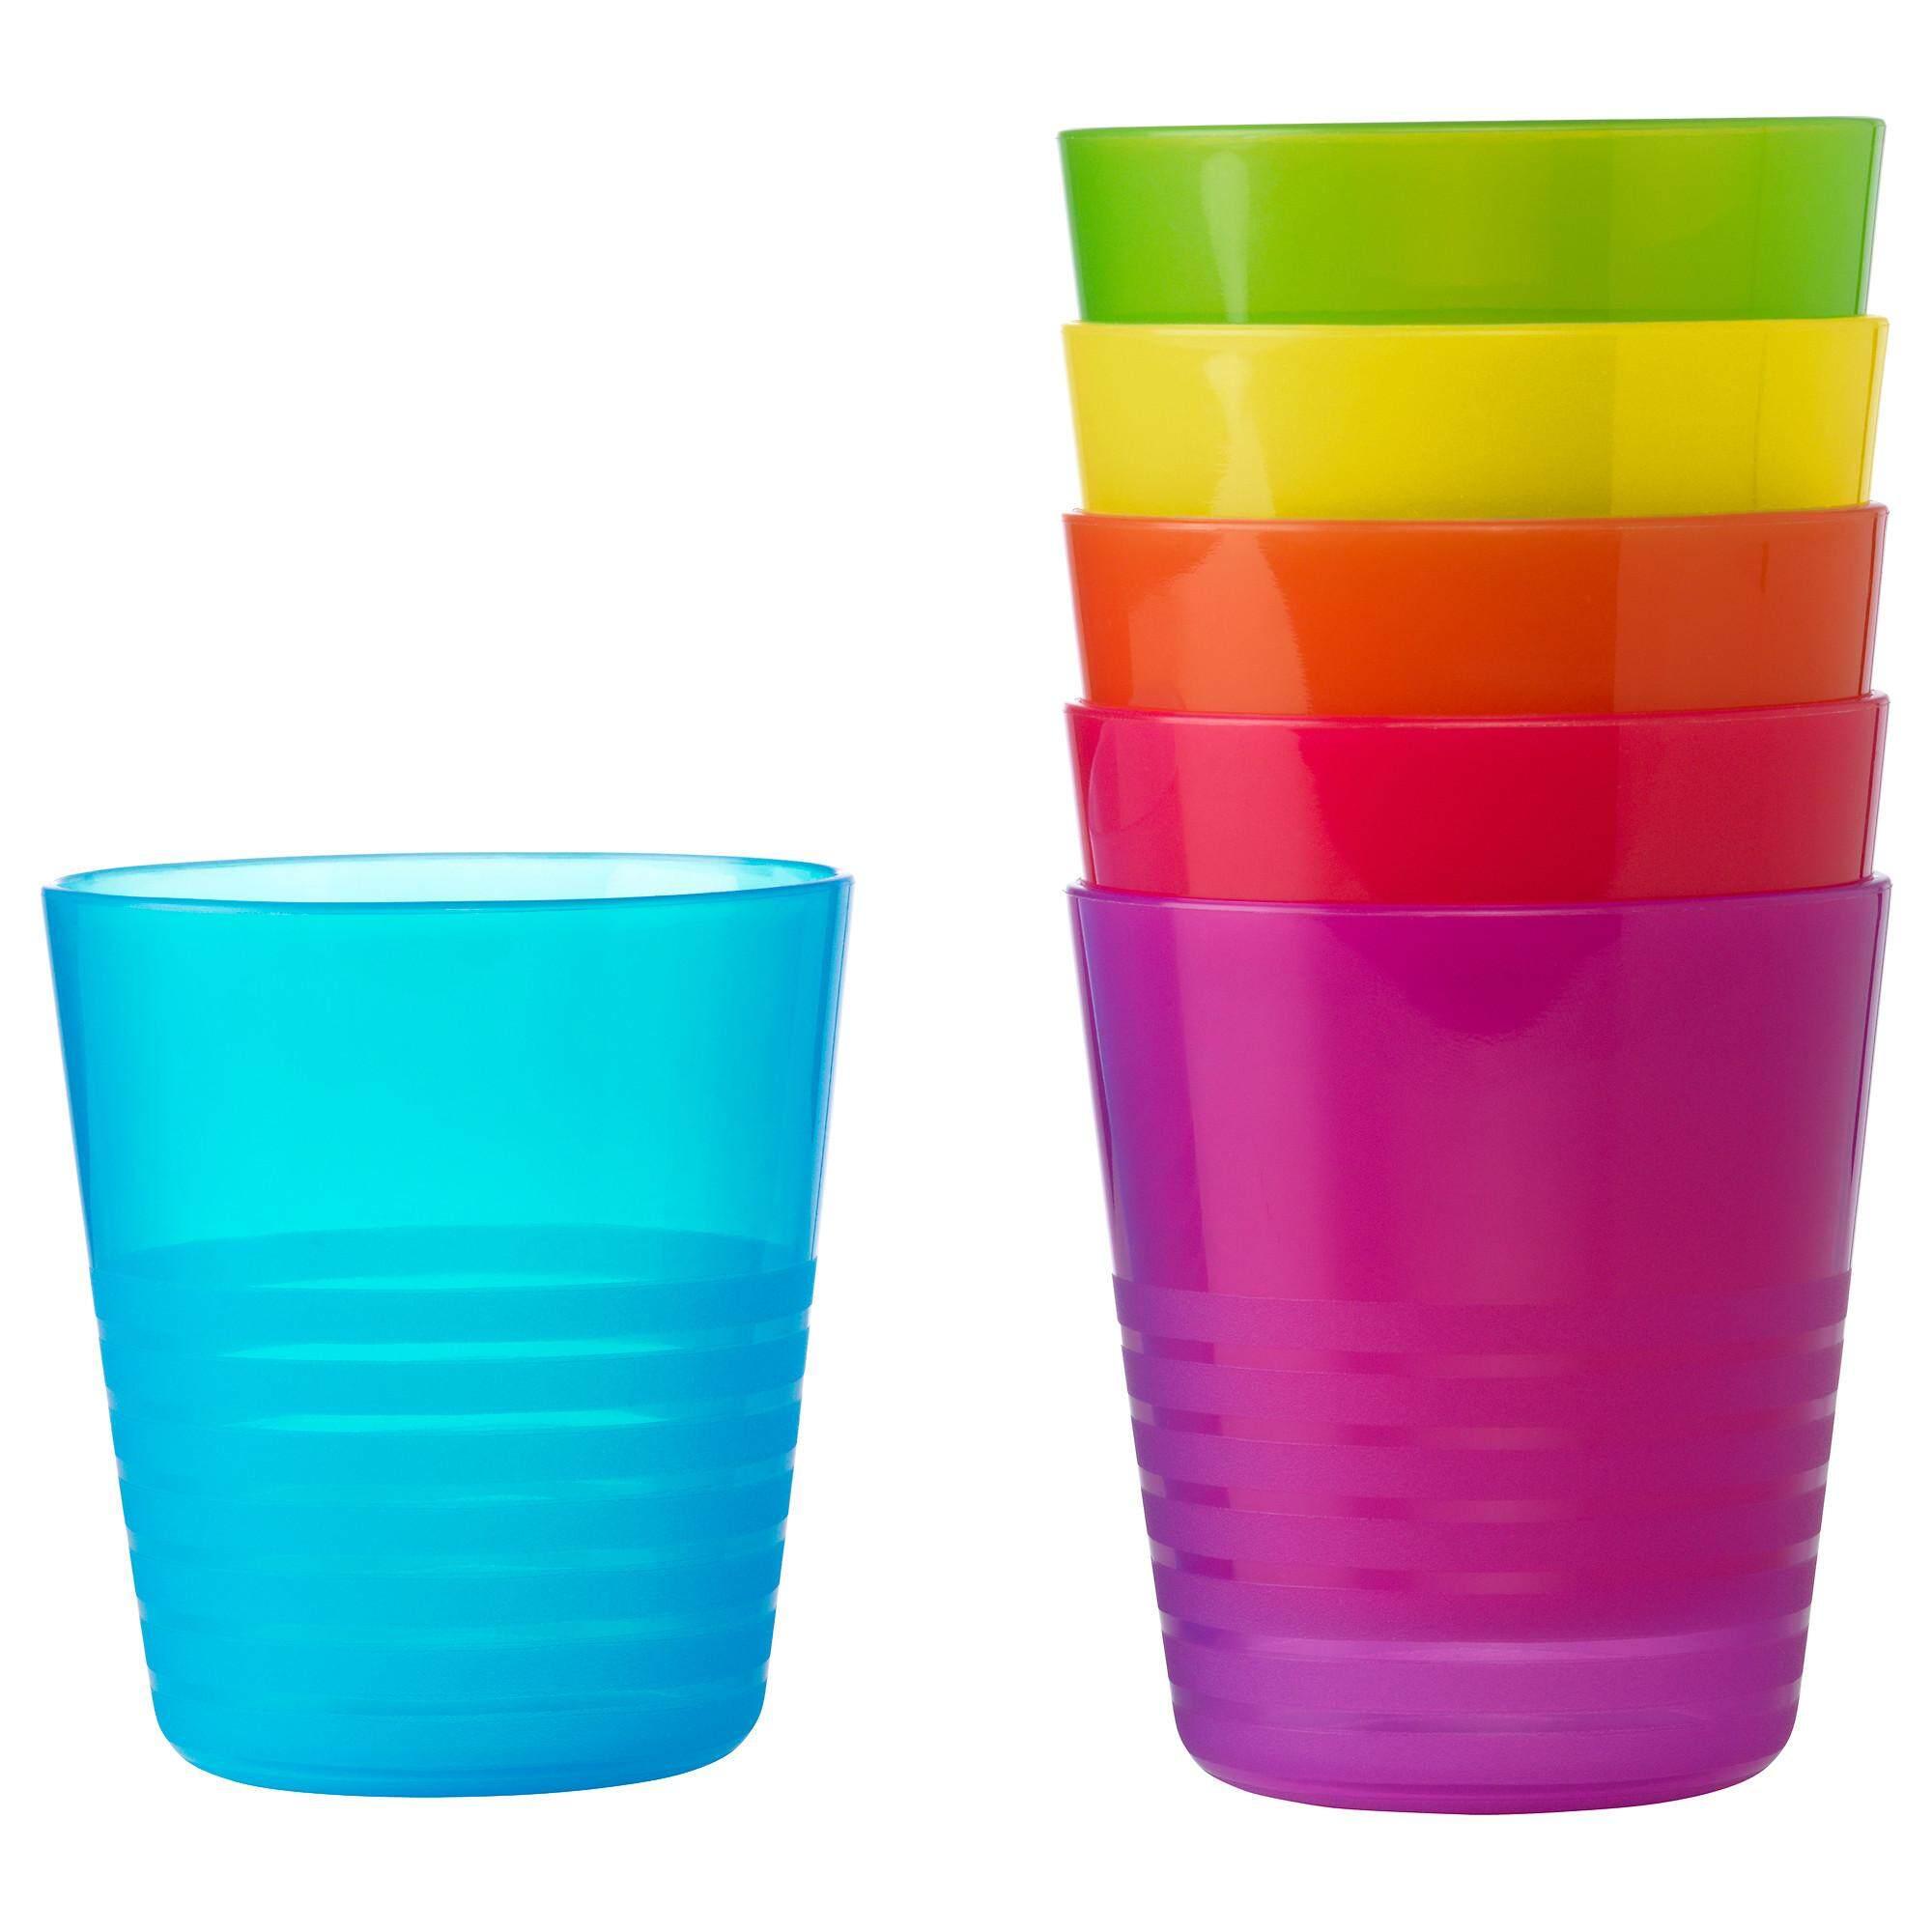 Mama แก้วมัค 6 ชิ้น เซ็ทสีพาสเทล/เซ็ทสีเข้ม นำเข้าไมโครเวฟได้ /คละสี.